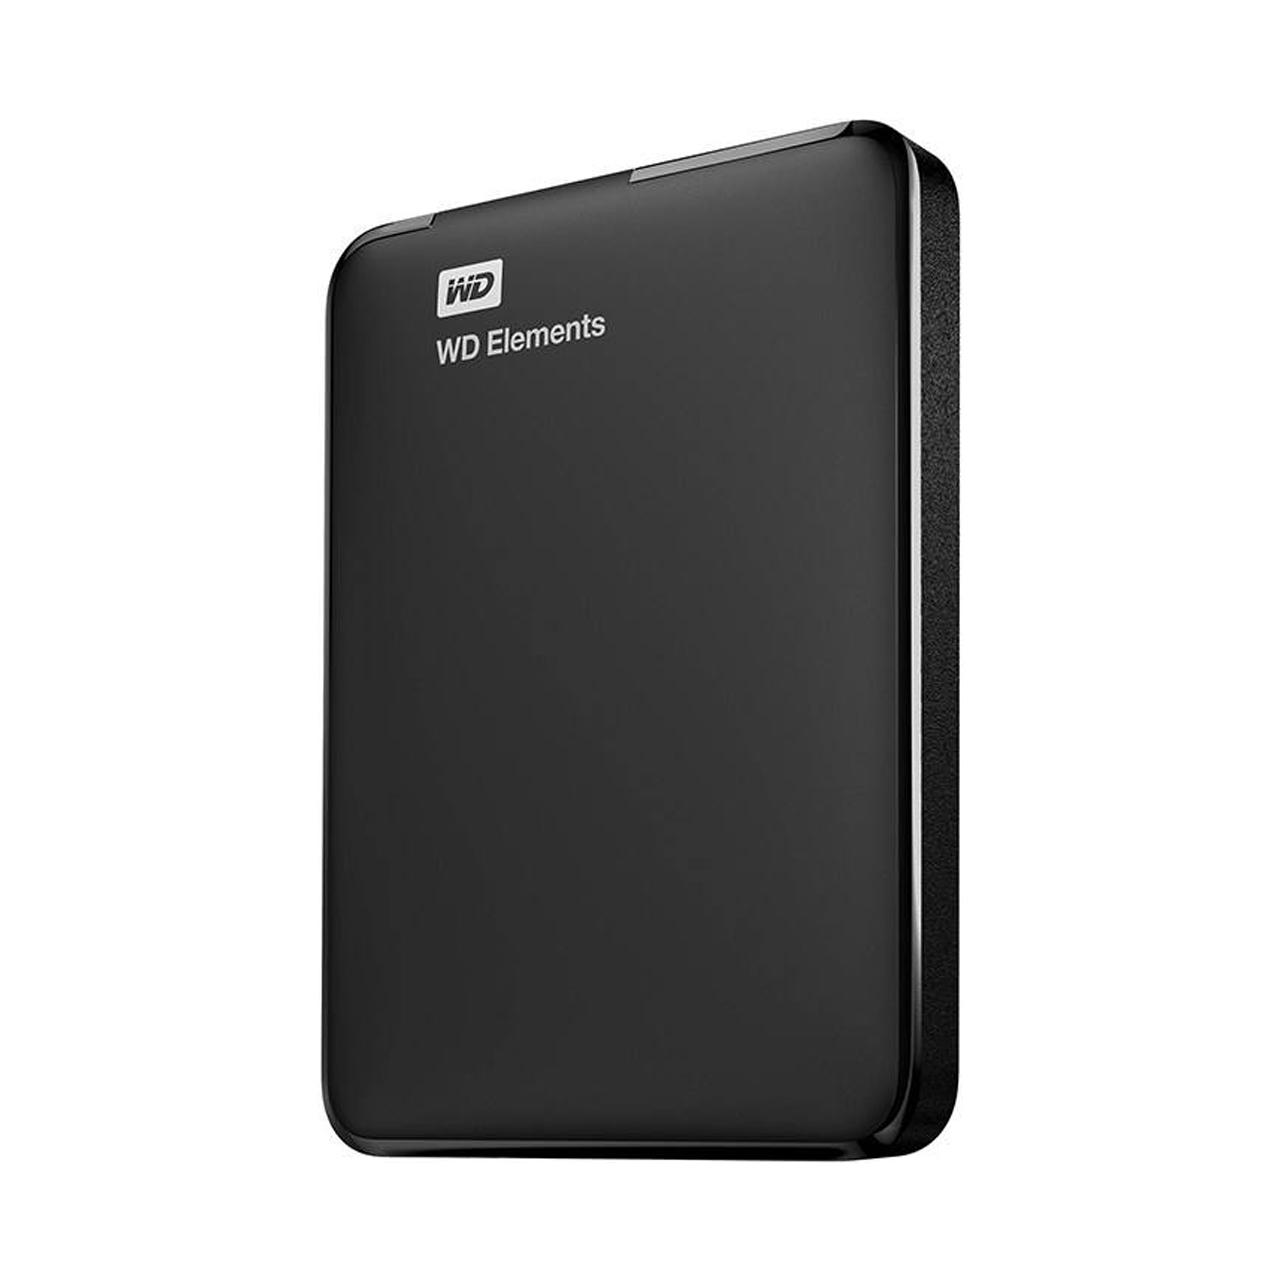 حافظه جانبی Western Digital مدل المنتس با ظرفیت 1TB